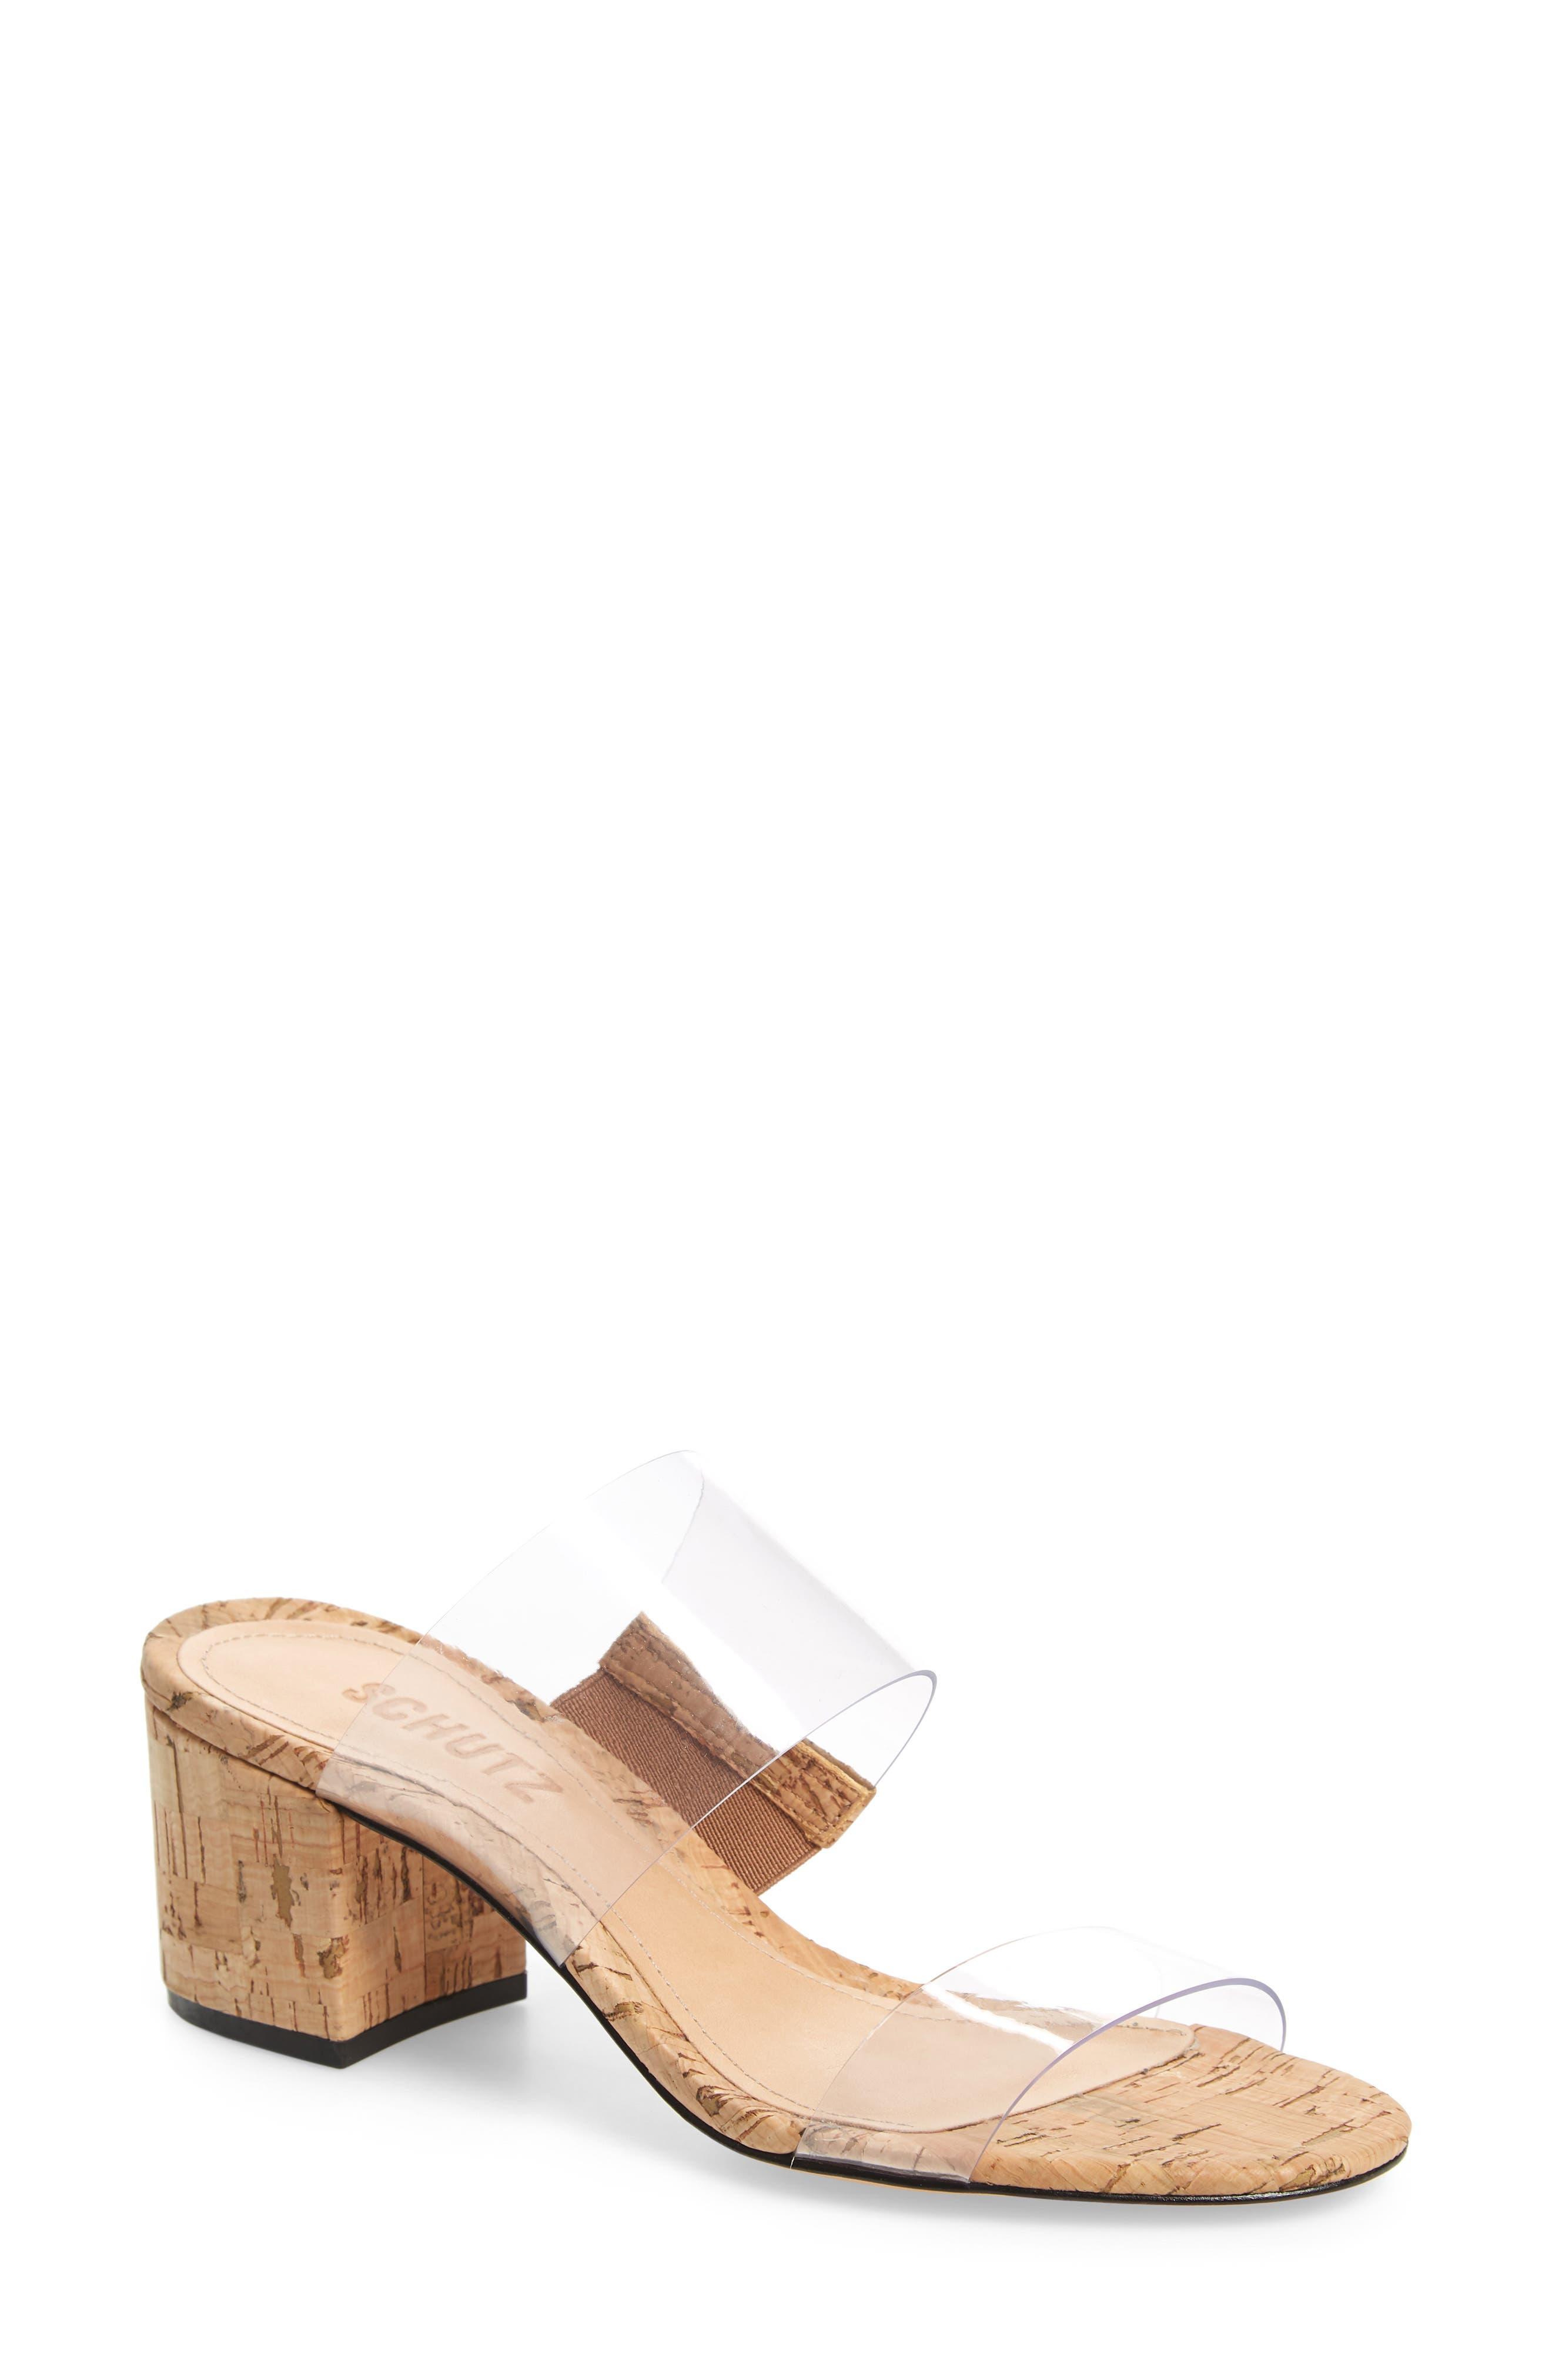 SCHUTZ Victorie Slide Sandal, Main, color, TRANSPARENT/ NATURAL